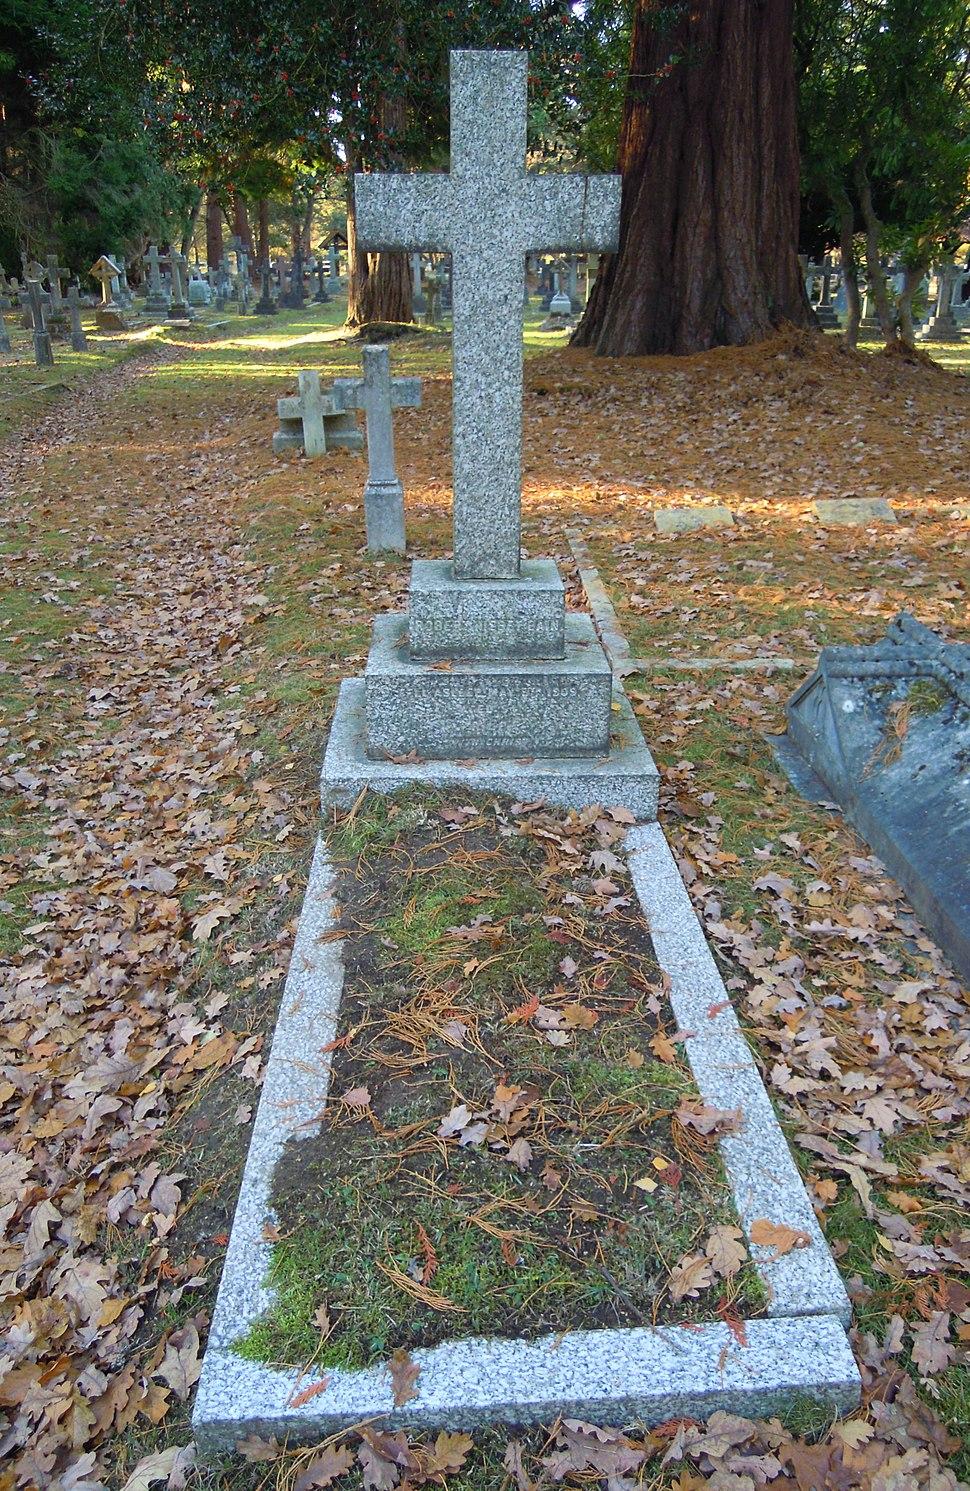 Robert Nisbet Bain Grave